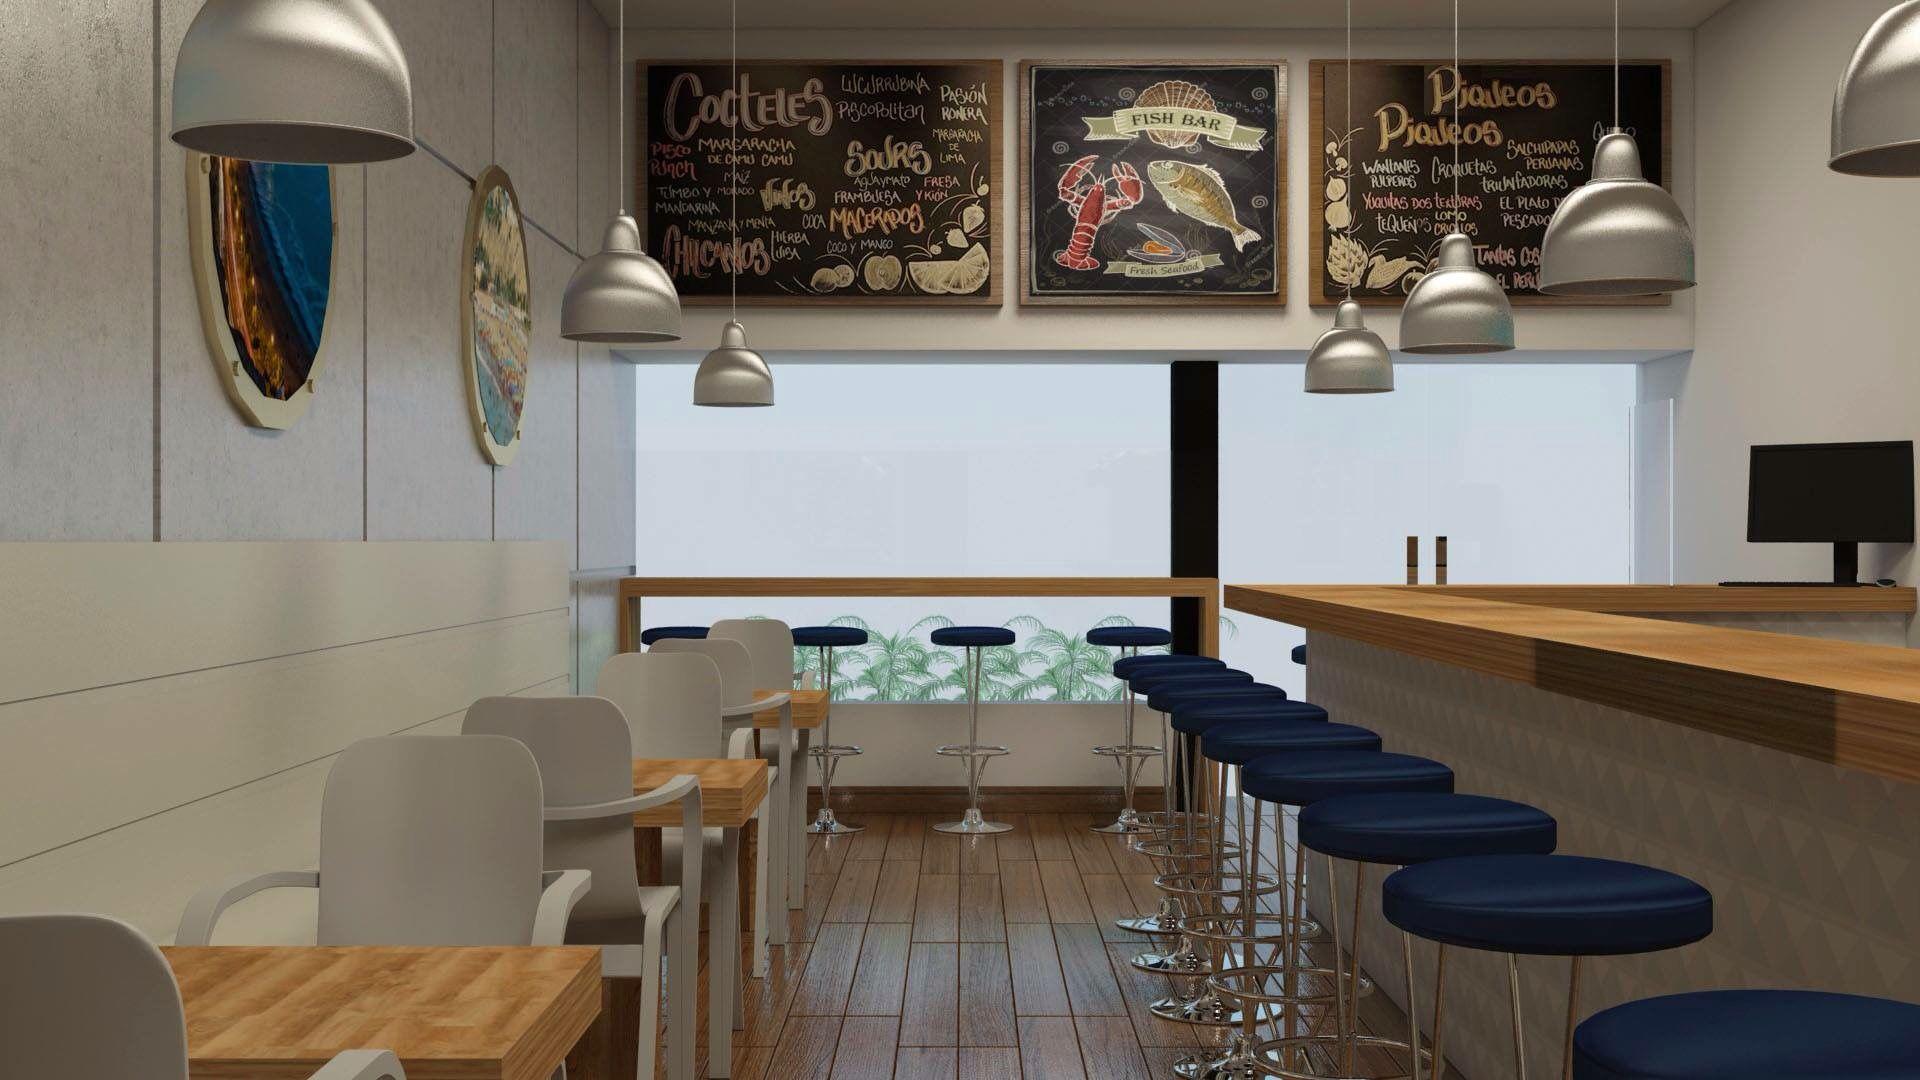 Dise O Restaurant Cevicheria Barra Marina Donde Podr N  # Muebles Dettaglio Condesa